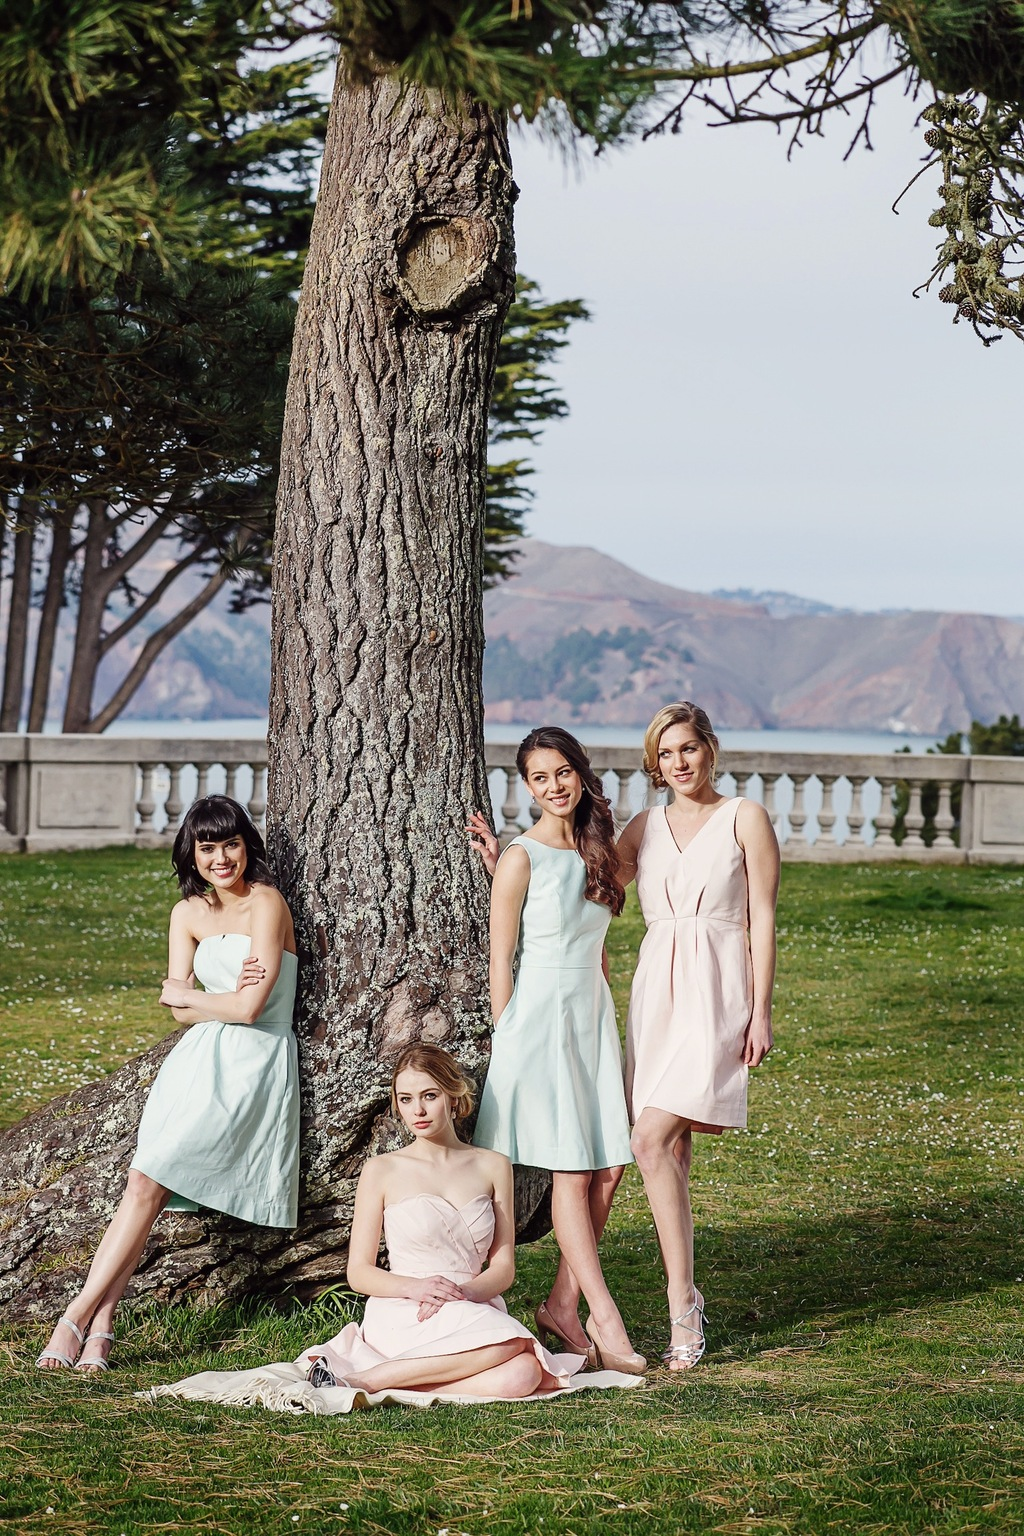 Mint_and_blush_bridesmaids_dresses_by_weddington_way.full